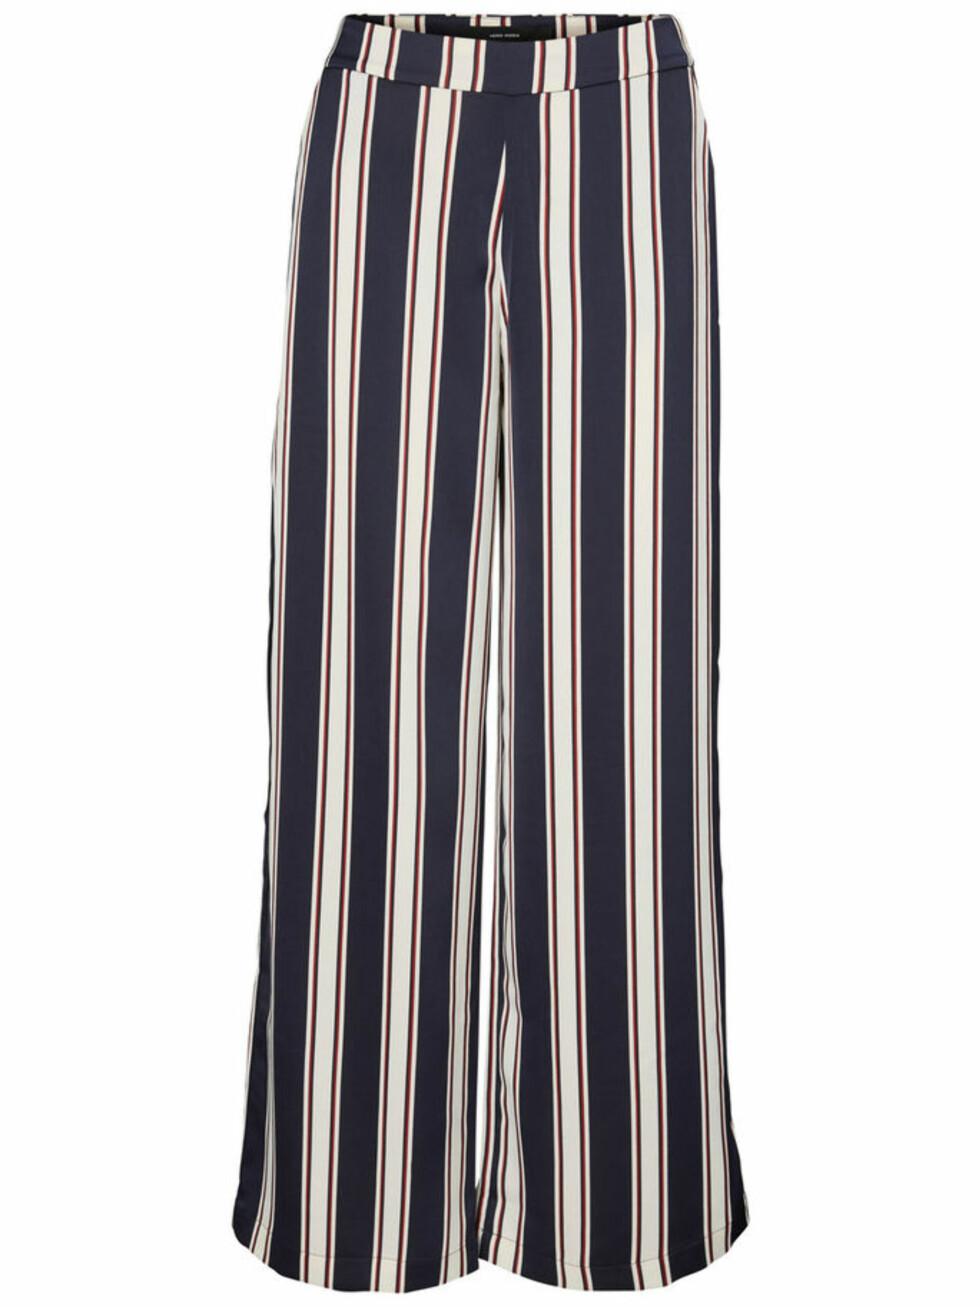 Bukse fra Vero Moda |380,-| https://www.veromoda.com/no/no/vm/handla-efter-kategori/bukser-and-leggings/loose-fit-bukser-10191750.html?cgid=vm-trousers&dwvar_colorPattern=10191750_NightSky_611580